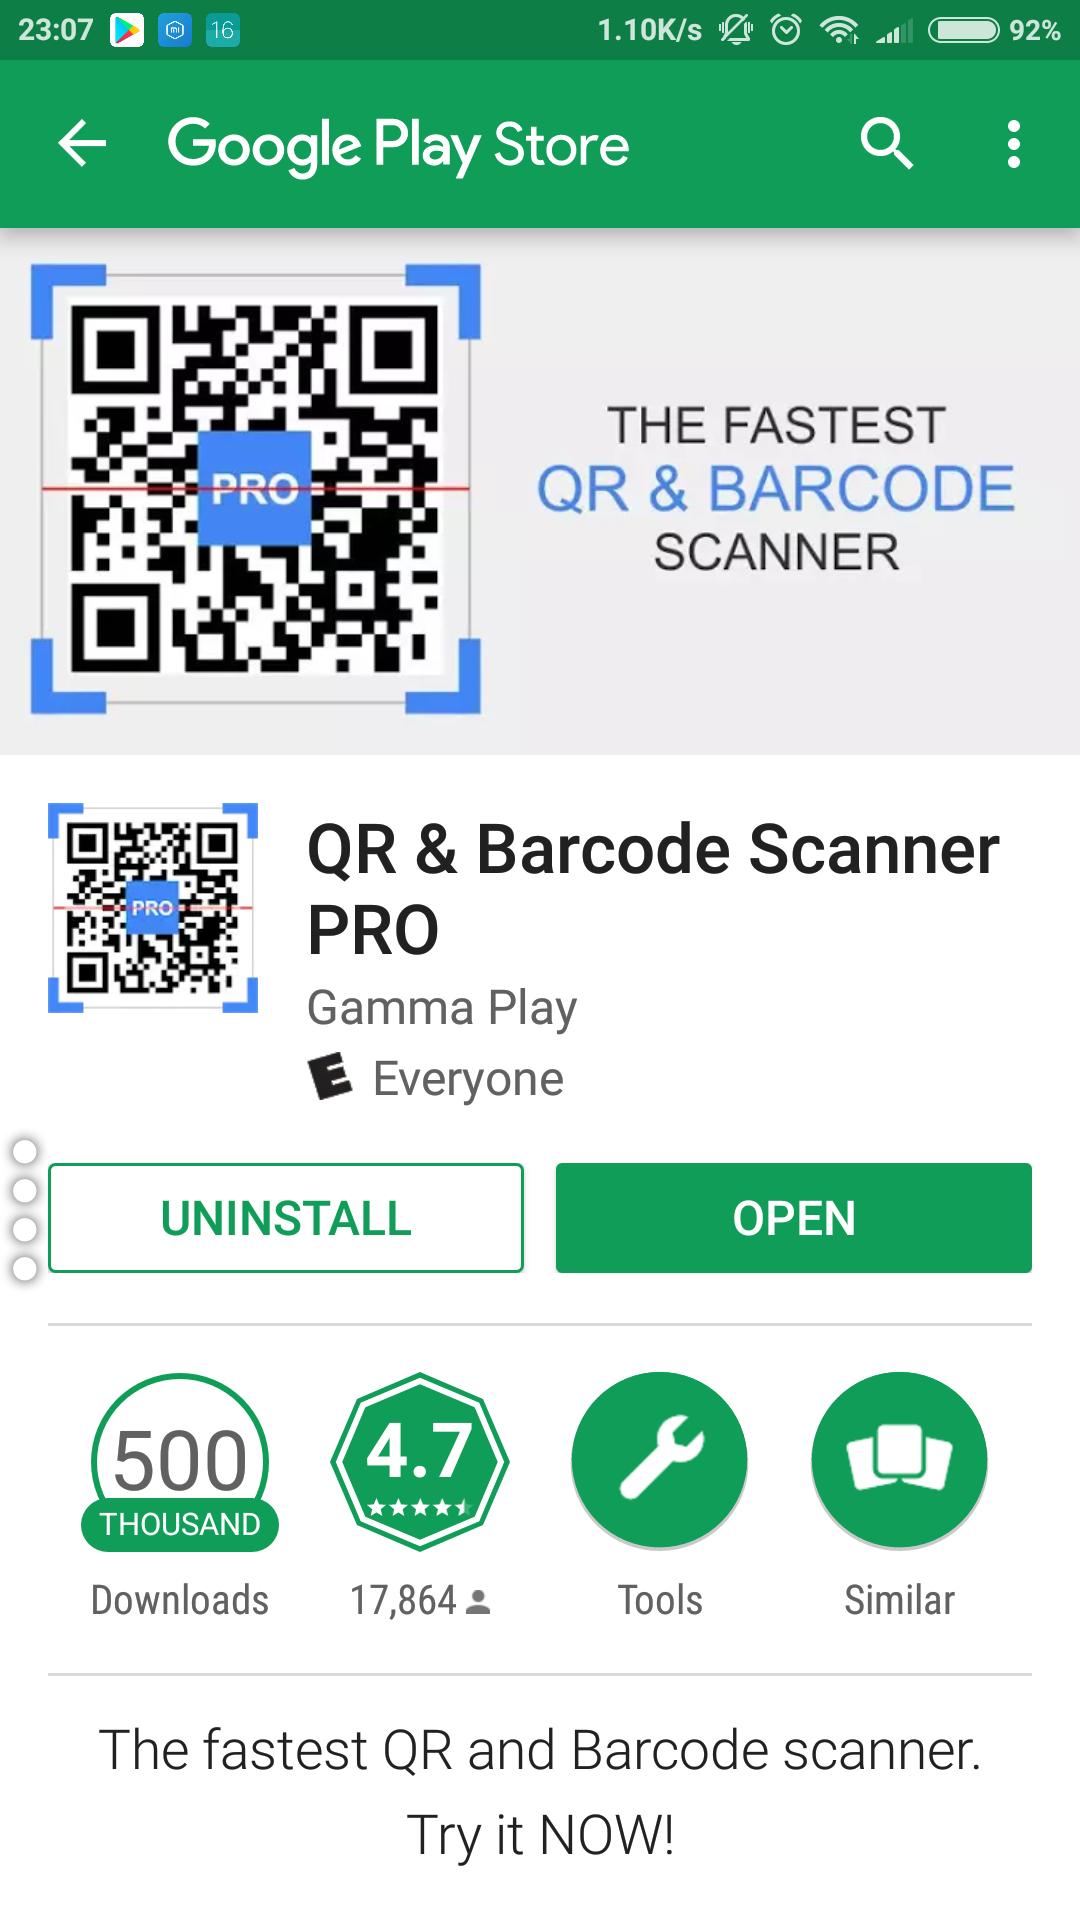 Google play: QR & Barcode Scanner PRO